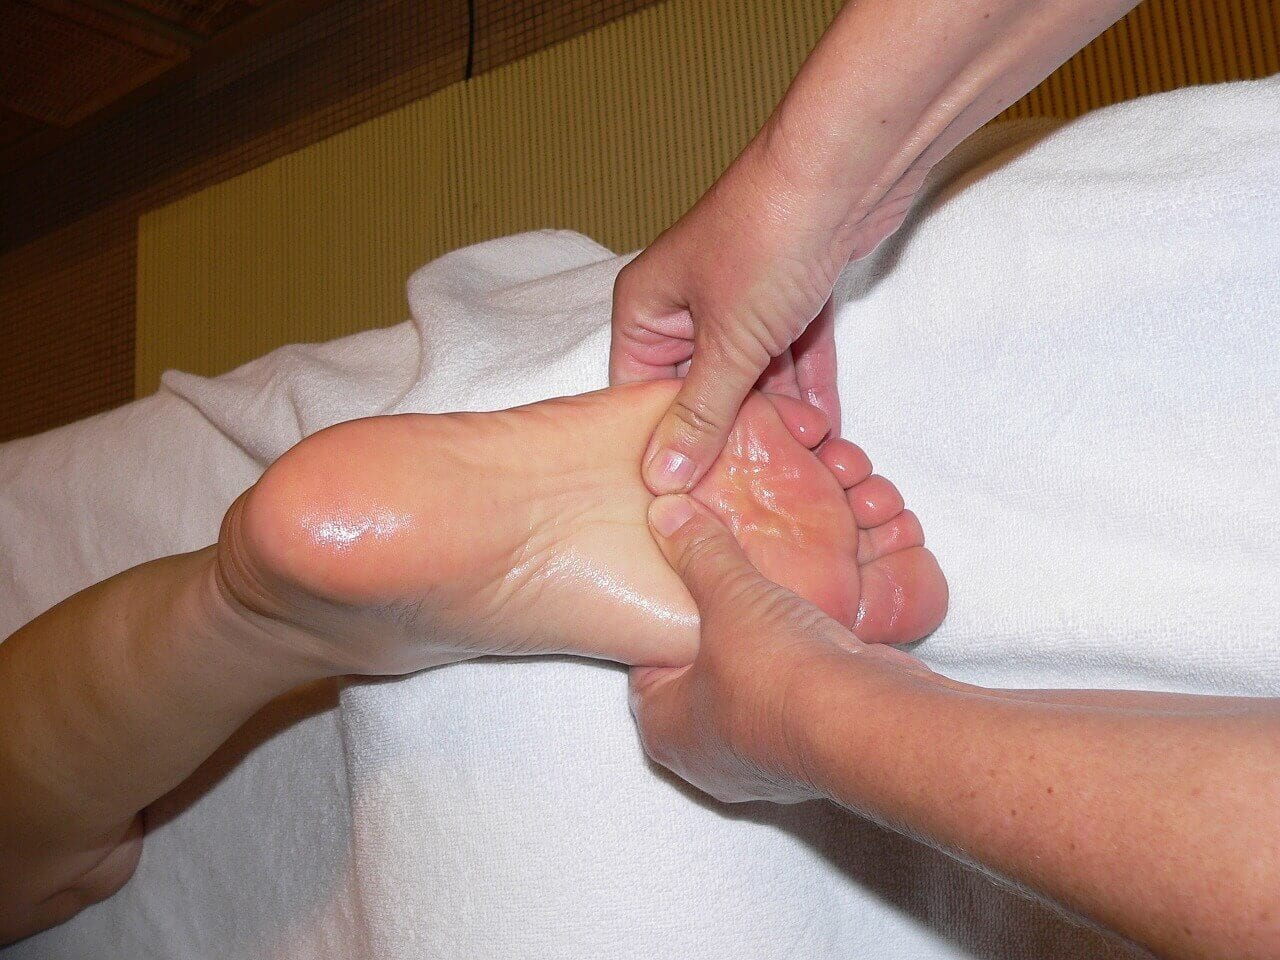 Foot Massage - 10 Health Benefits of taking a Foot Massage